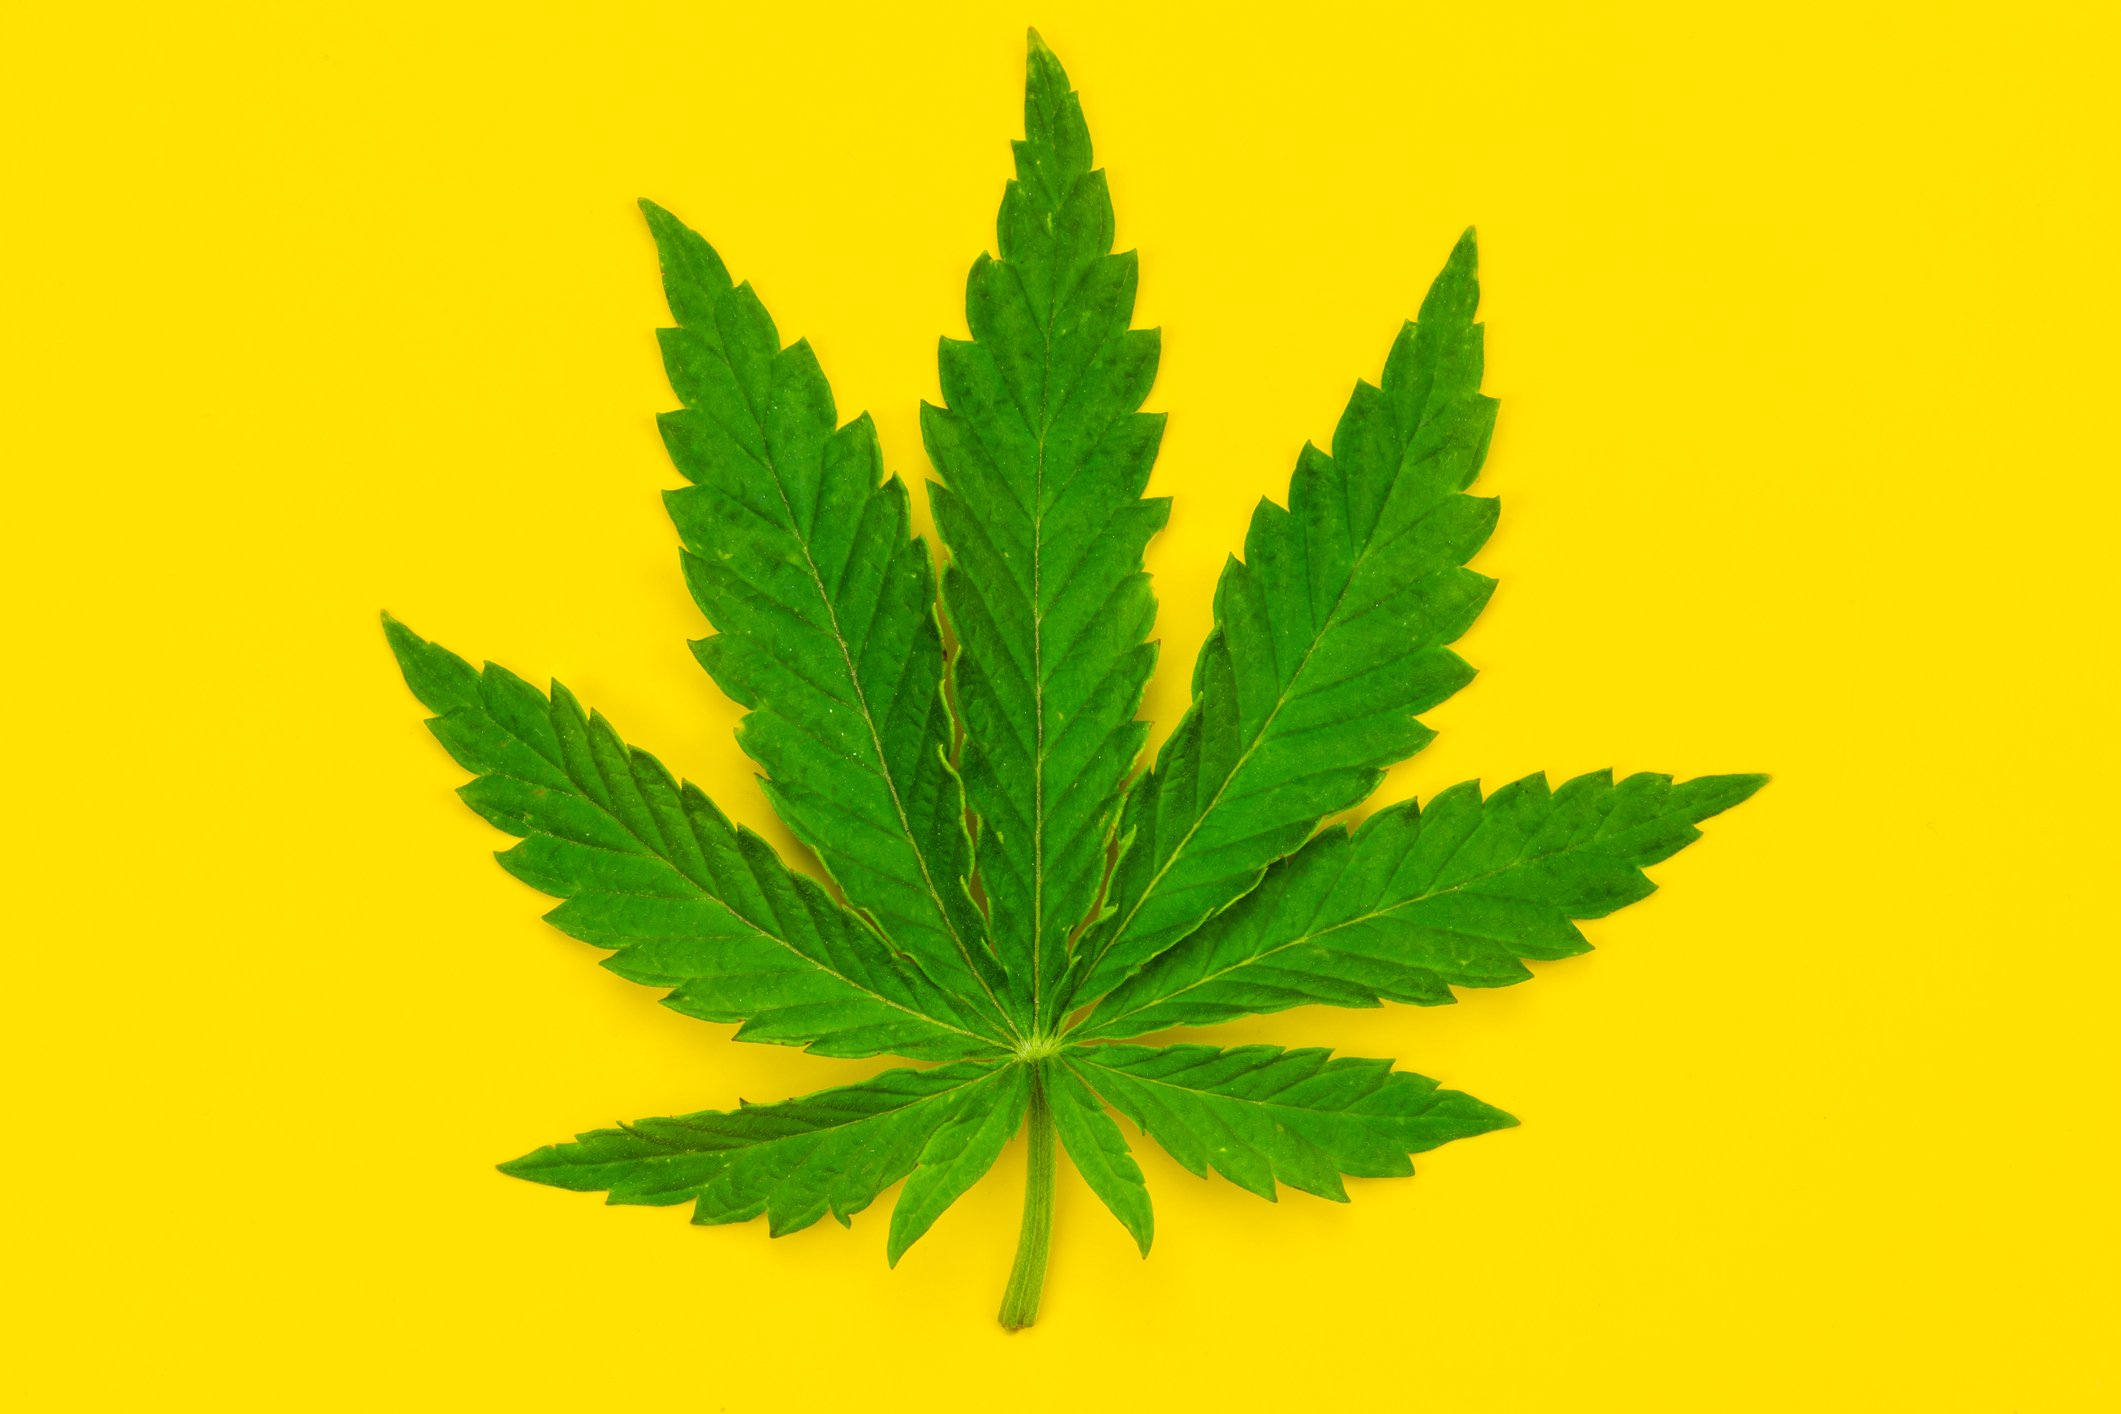 Marijuana leaf on a yellow background.